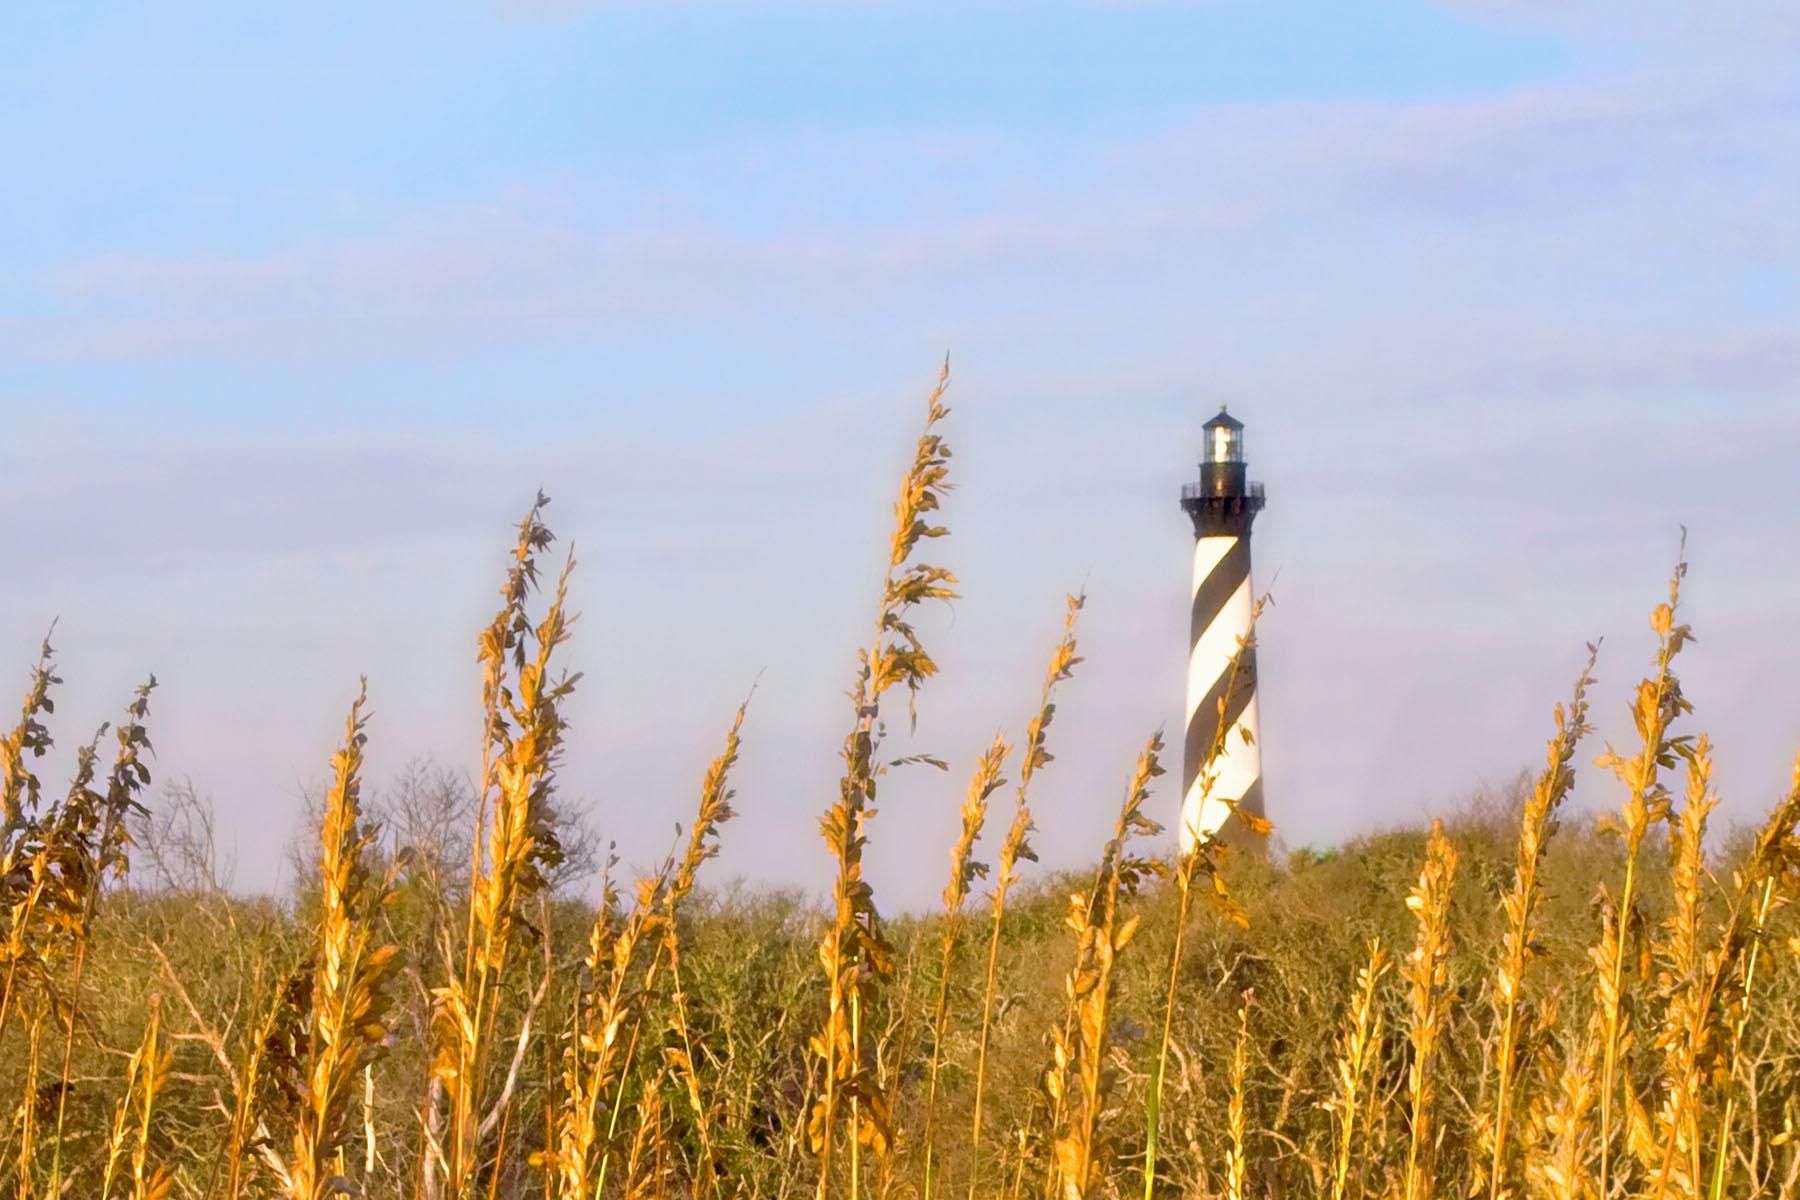 WILD OATS - Sea oats, nice sky, and a lighthouse. Just aim and shoot.